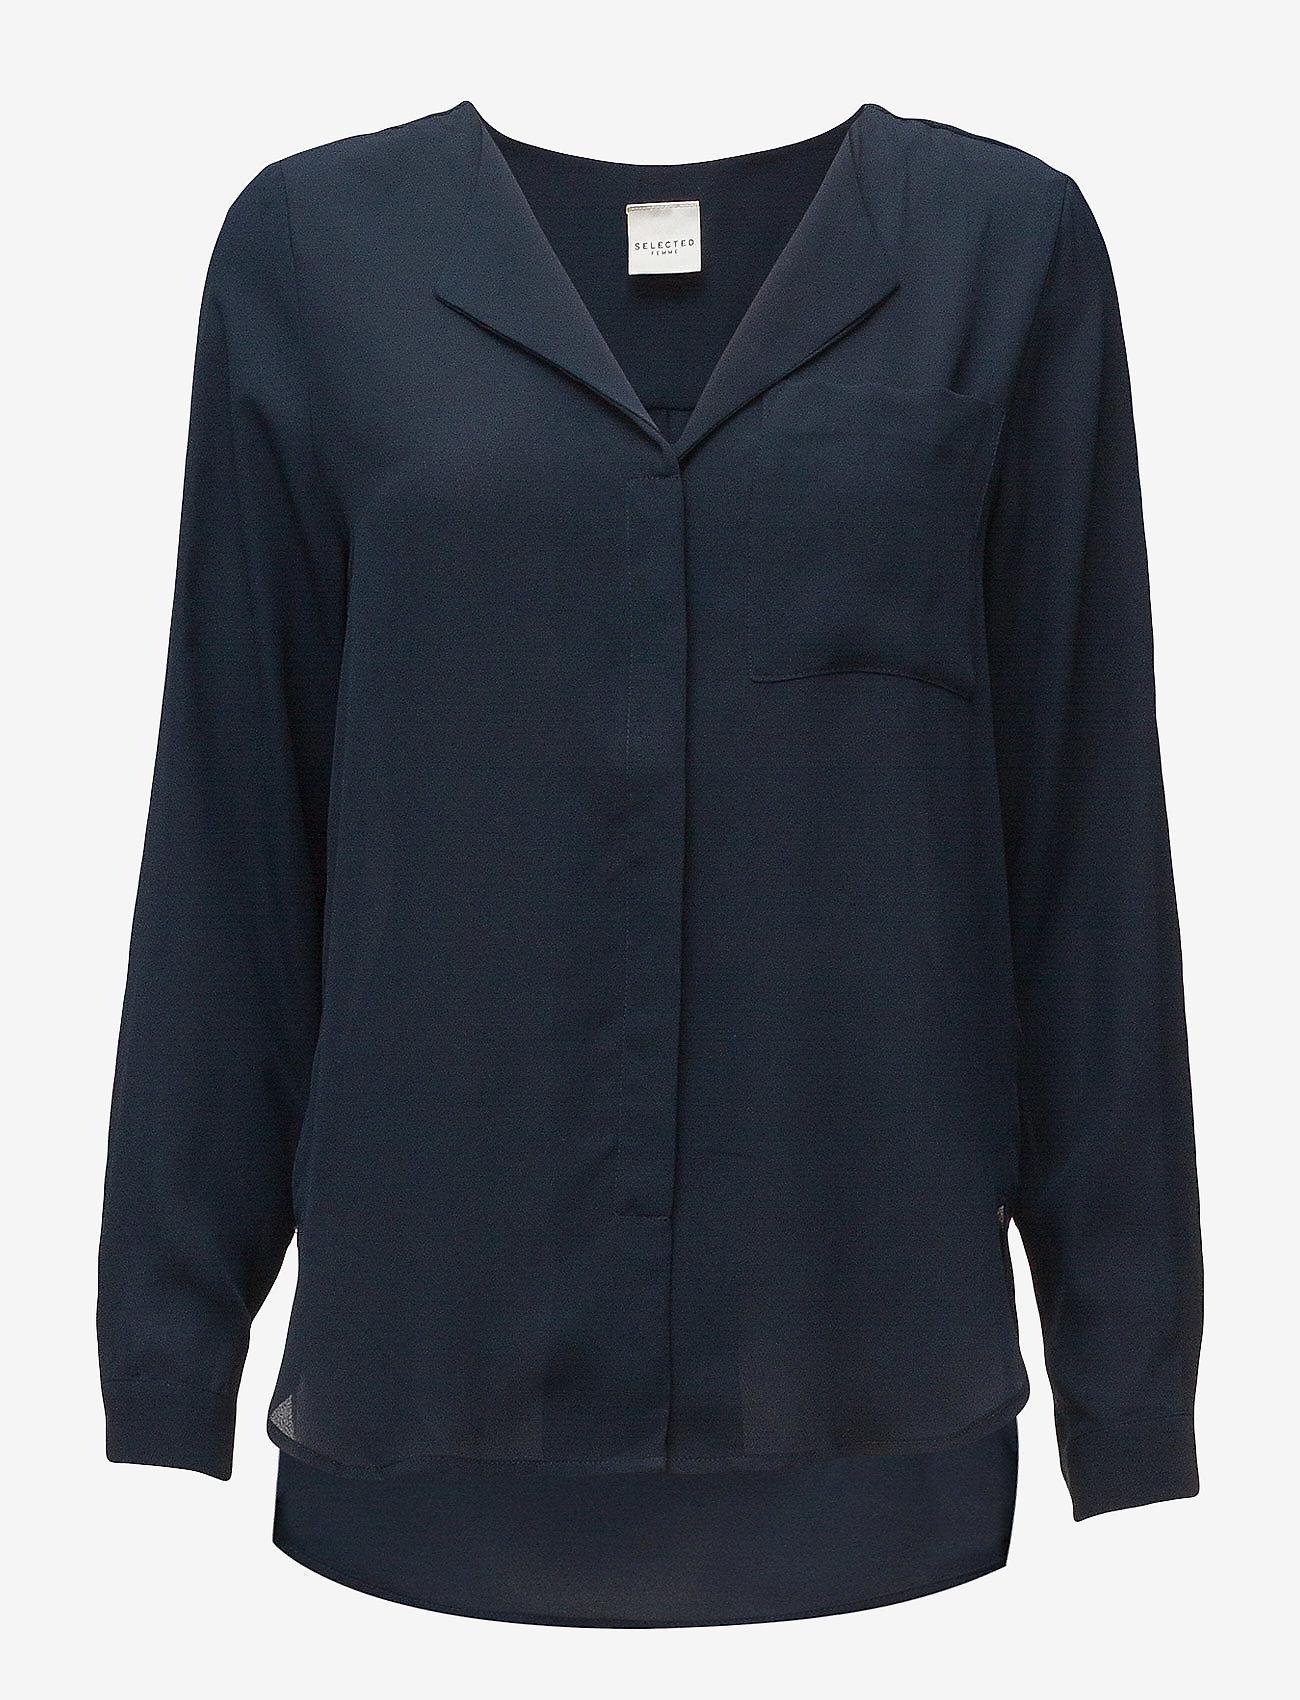 Selected Femme - SLFDYNELLA LS SHIRT NOOS - long sleeved blouses - navy blazer - 0